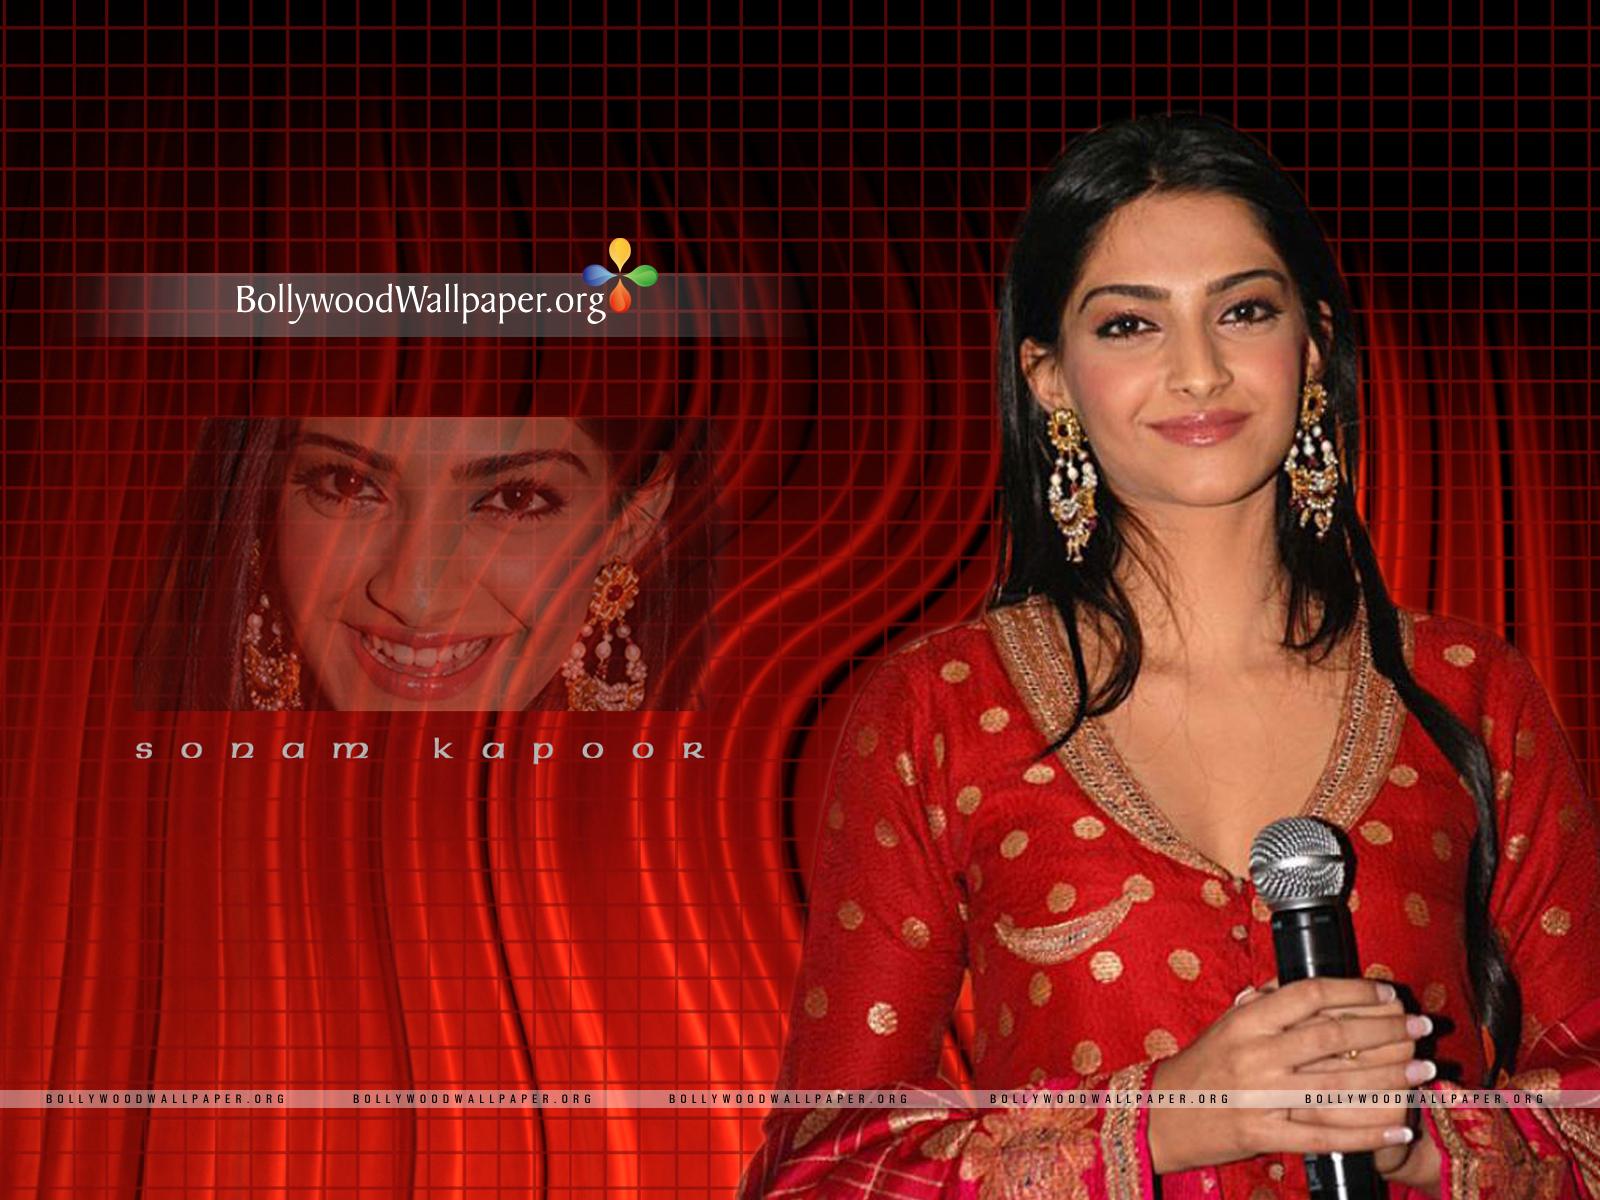 http://2.bp.blogspot.com/-ZbXG_0GTjcg/TnMyFzJnXjI/AAAAAAAAGZE/jSBK89DHHJ4/s1600/Beautiful+Sonam+Kapoor+HD+wallpaper+001.jpg